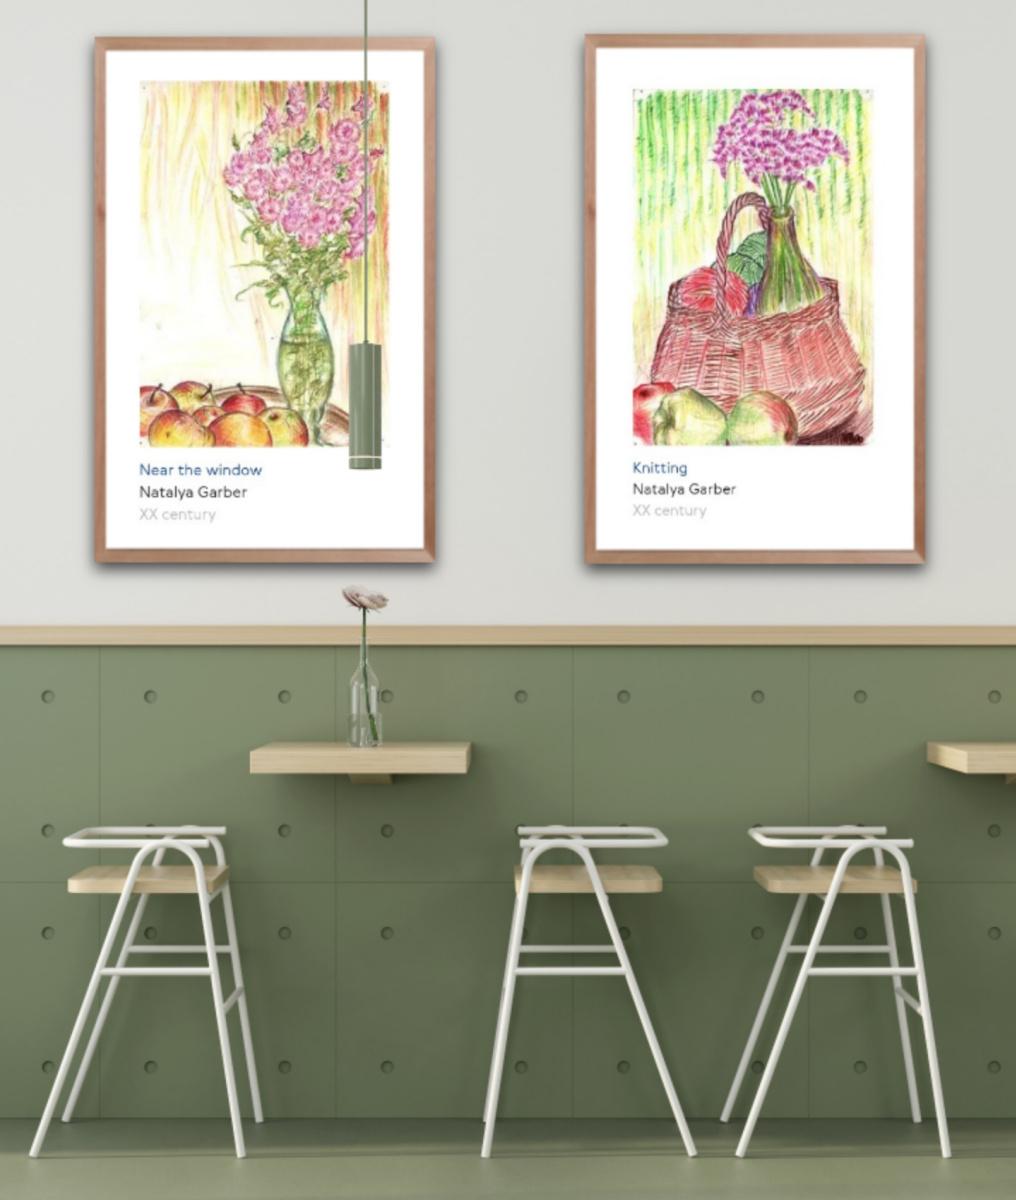 Natalya Garber. Apples. Pair of still lifes for a cafe